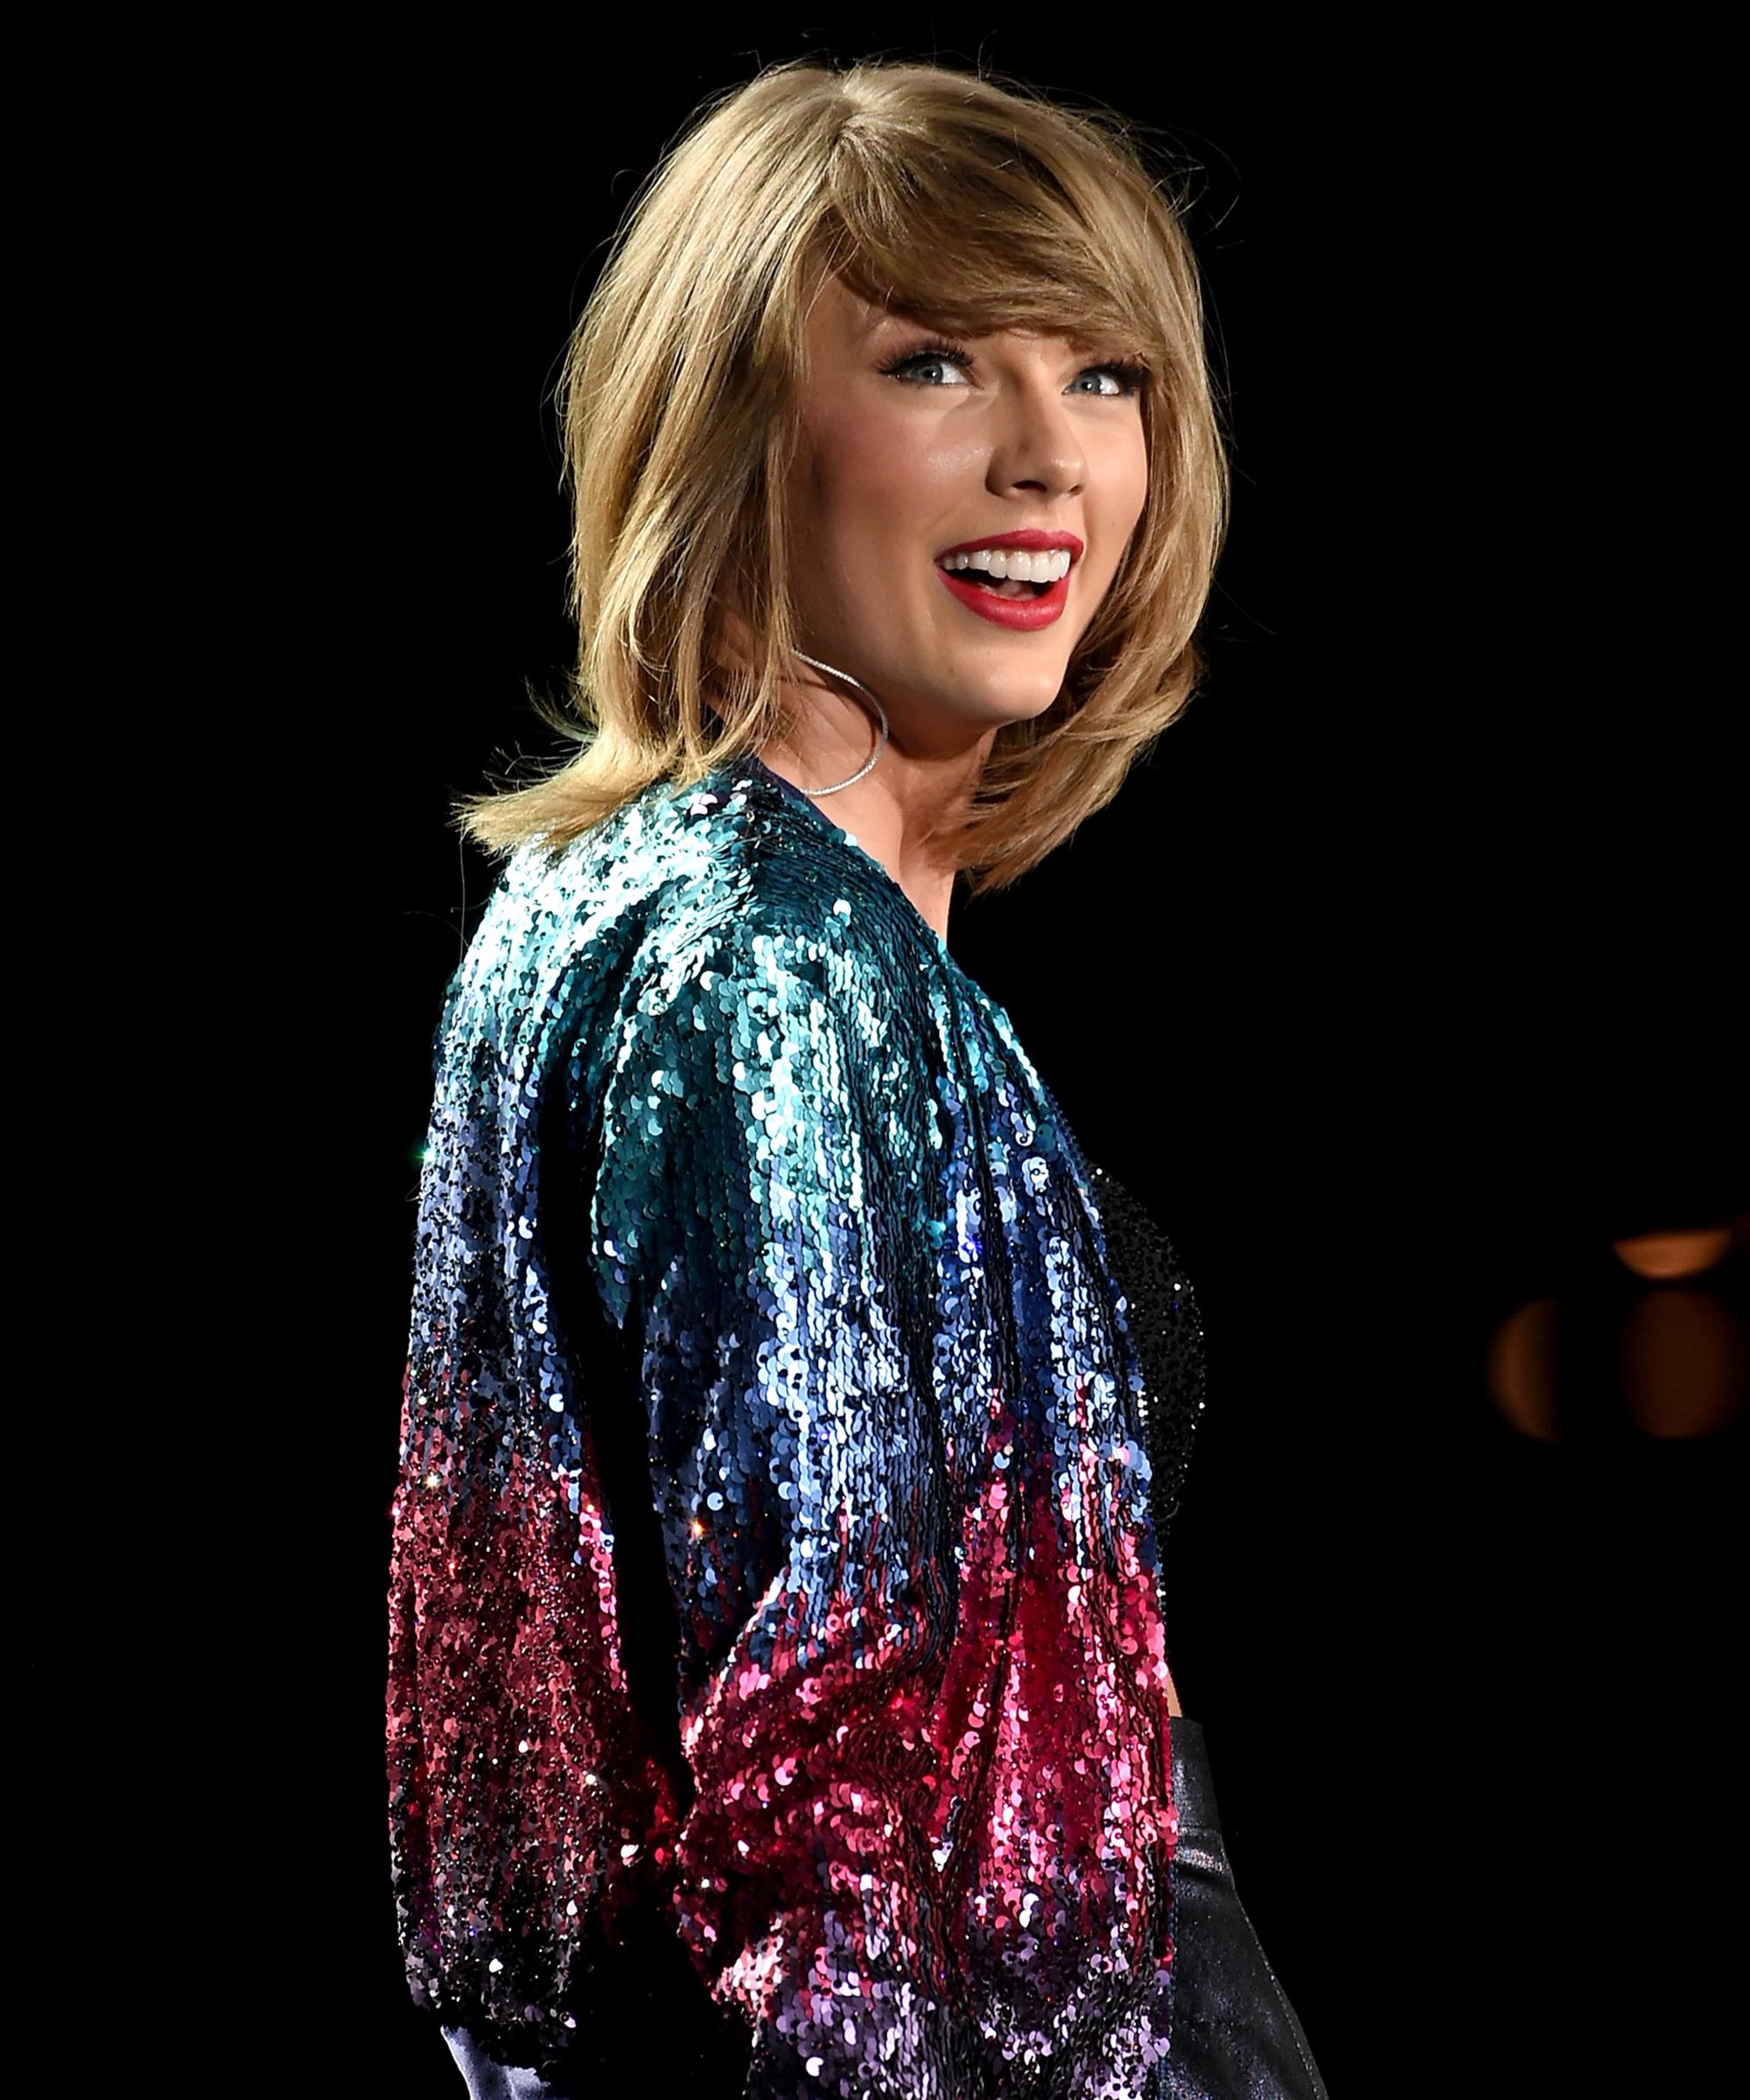 Taylor Swift Costumes Music Video Ideas Halloween 2018